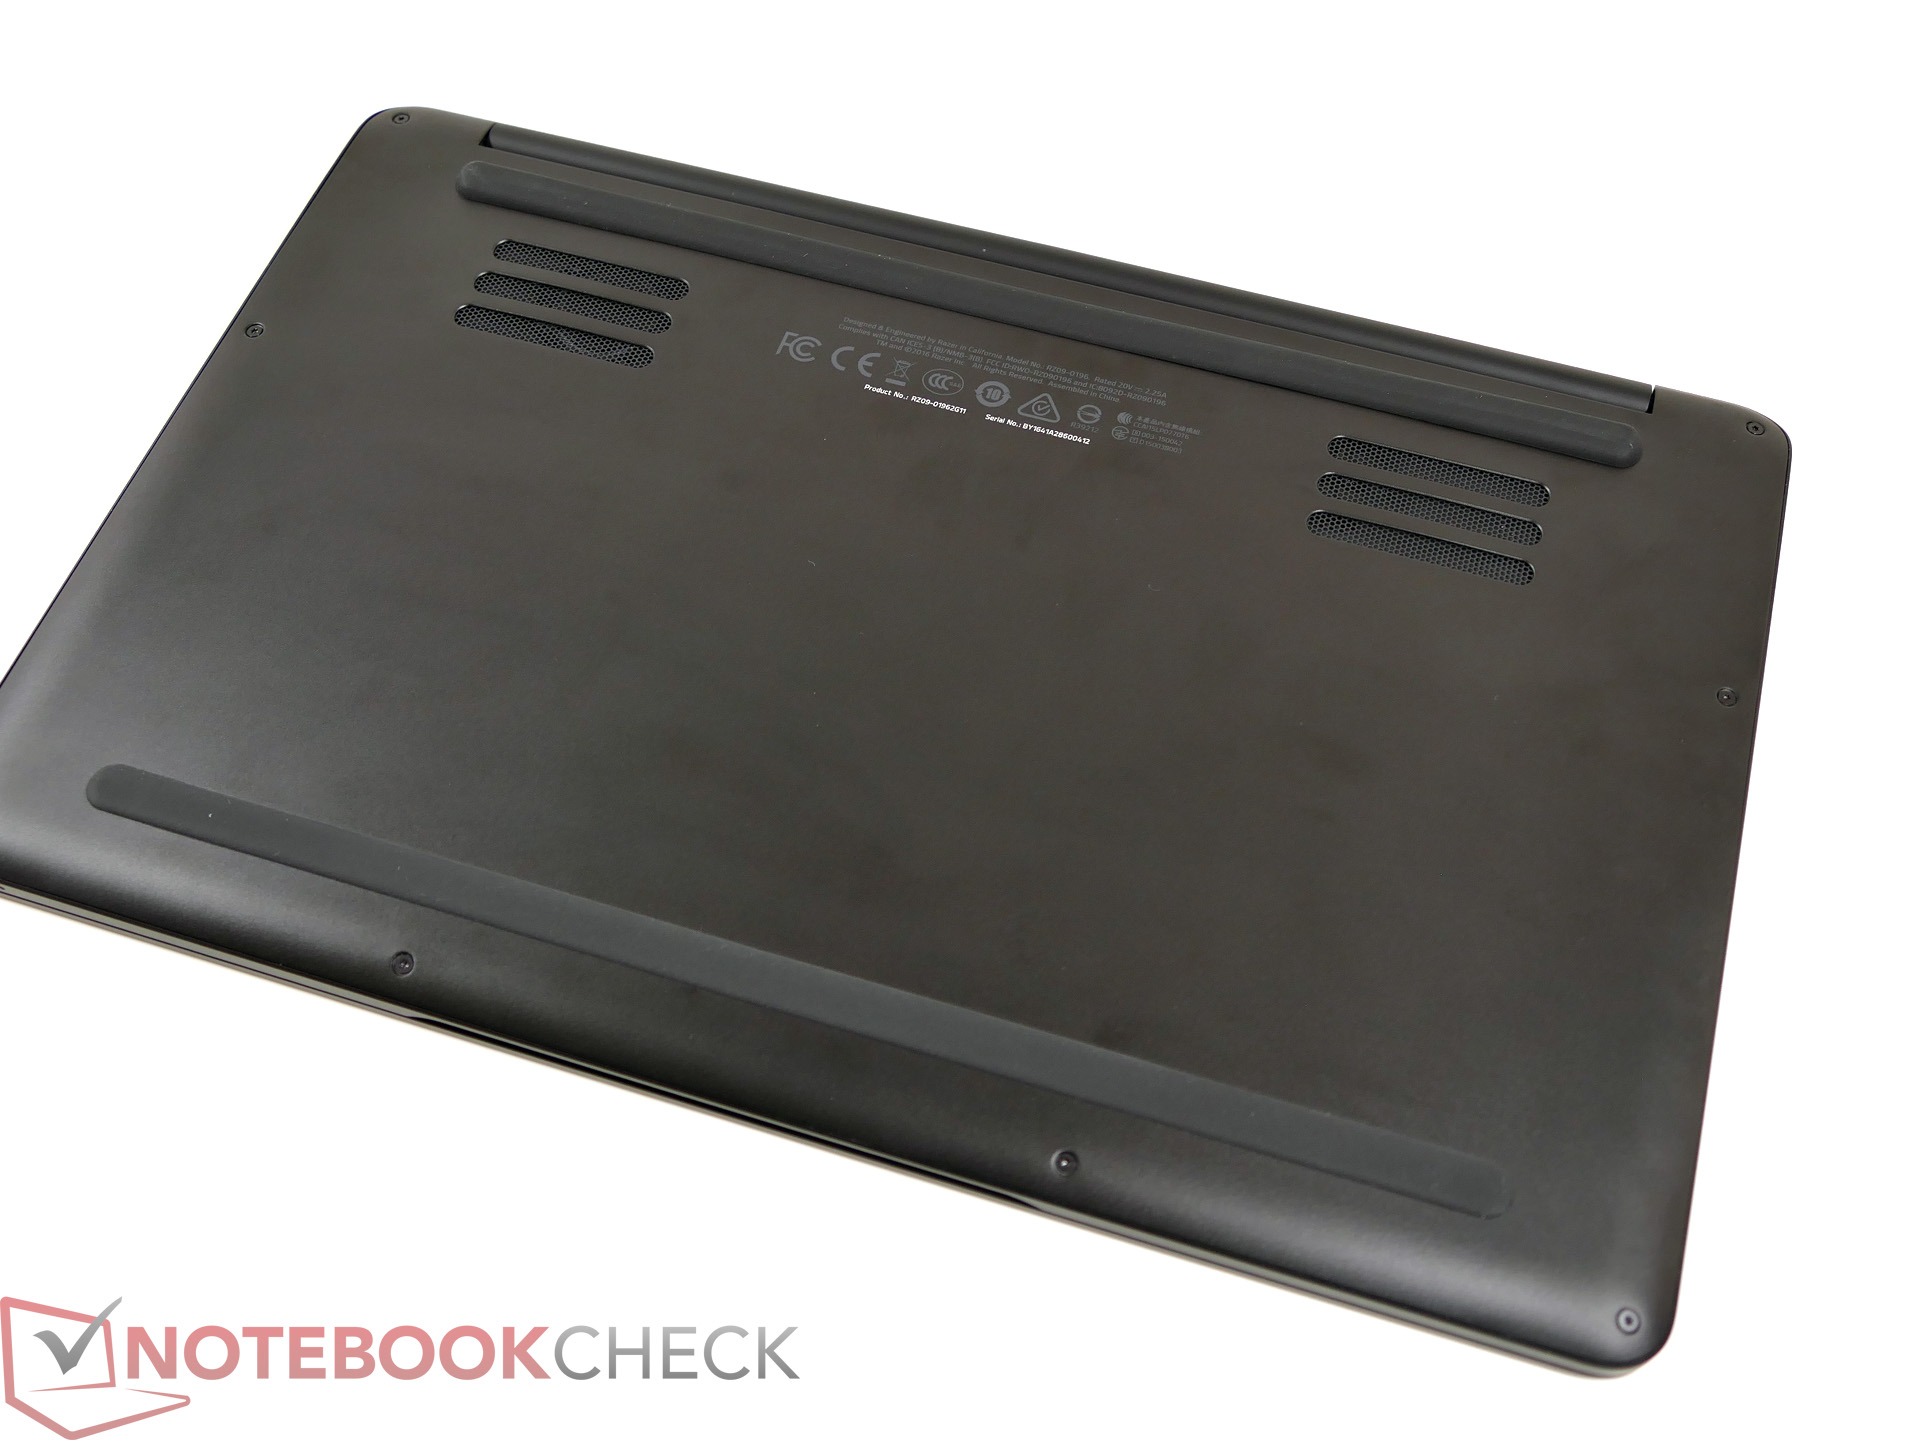 Razer Blade Stealth (i7-7500U) Notebook Review - NotebookCheck net